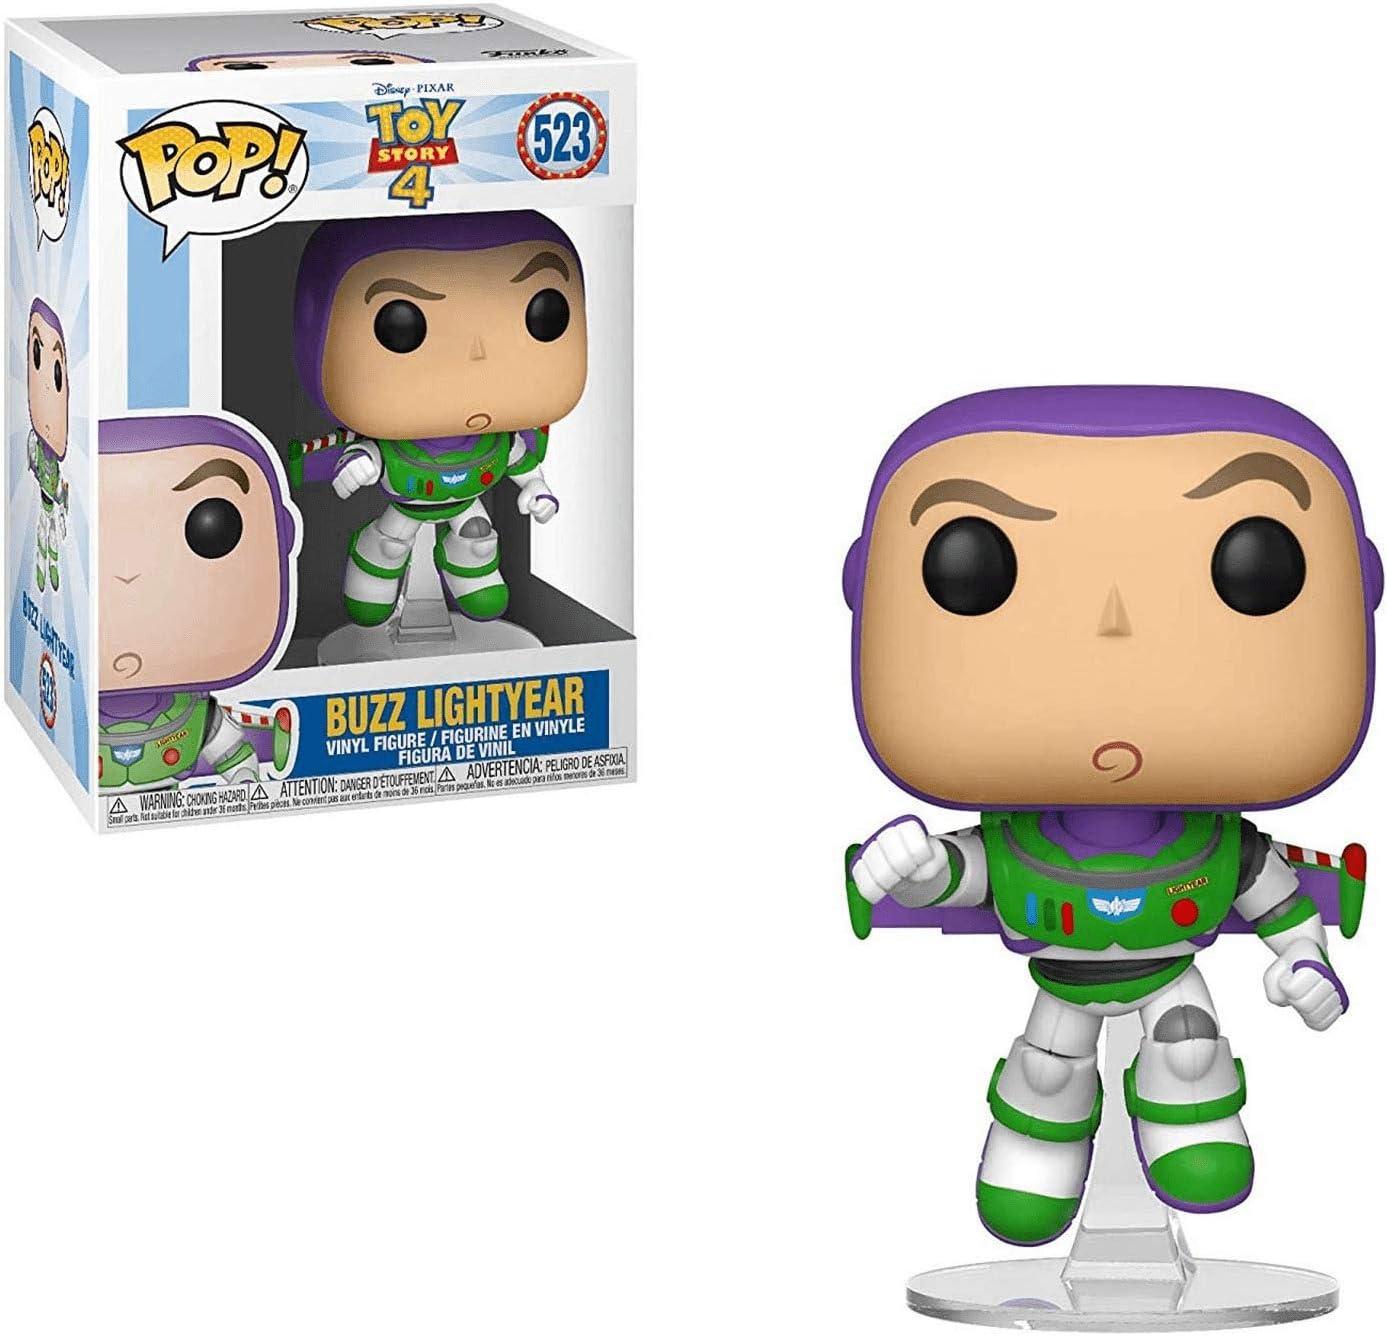 Funko- Pop Vinilo: Disney: Toy Story 4: Buzz Lightyear Figura Coleccionable, Multicolor, Talla Única (37390)